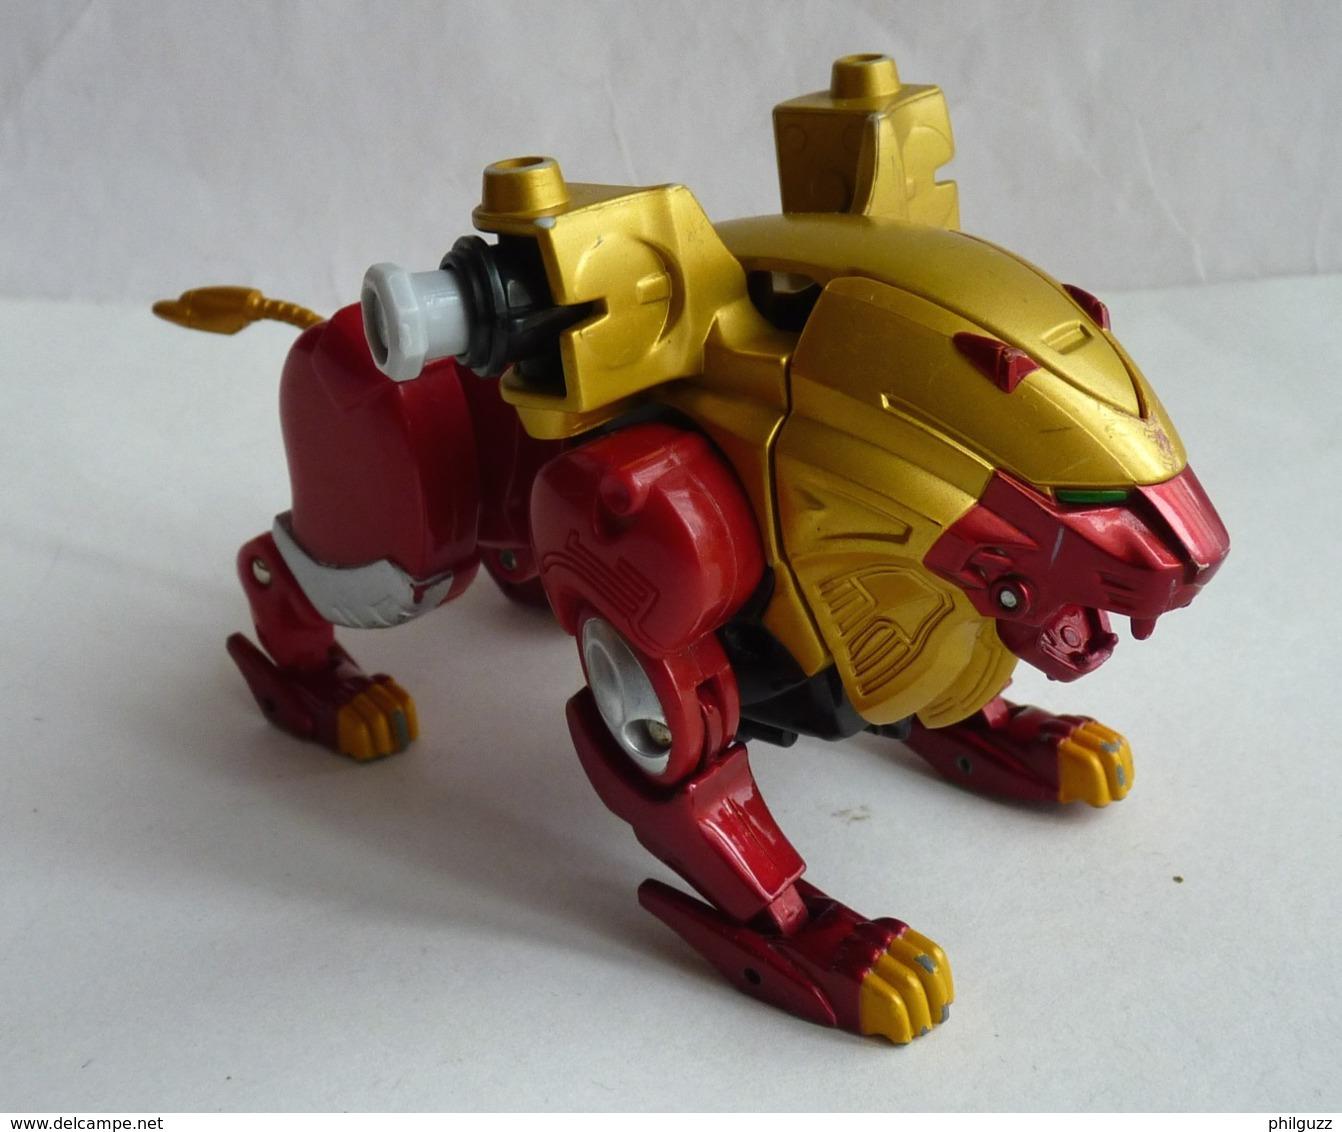 FIGURINE LION ROBOT TRANSFORMERS Origine Inconnue - Figurines